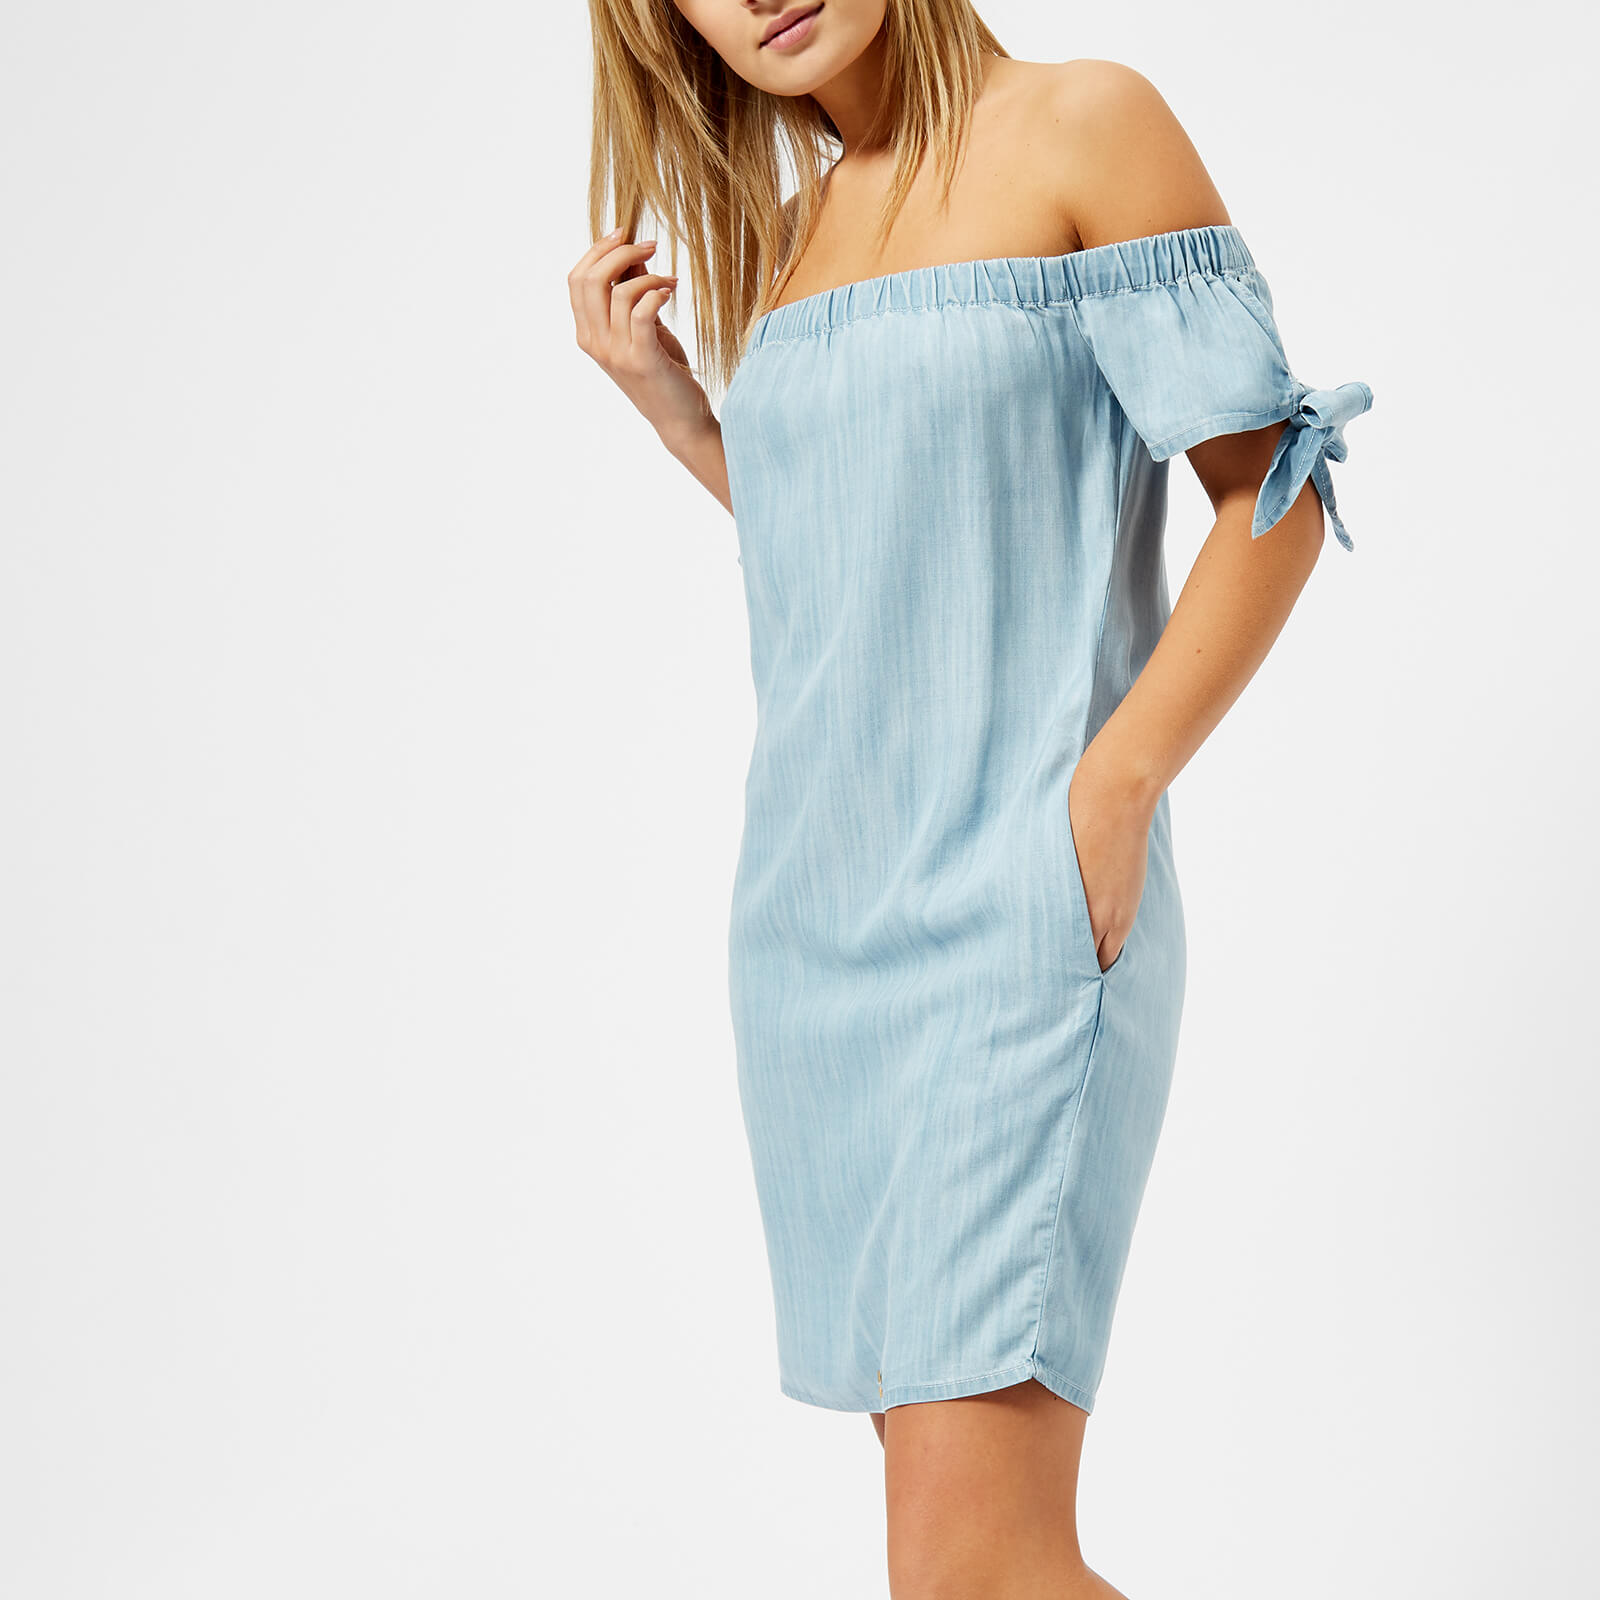 89e6d6447d Superdry Women s Alexia Off Shoulder Dress - Acid Wash Vacation Blue Womens  Clothing